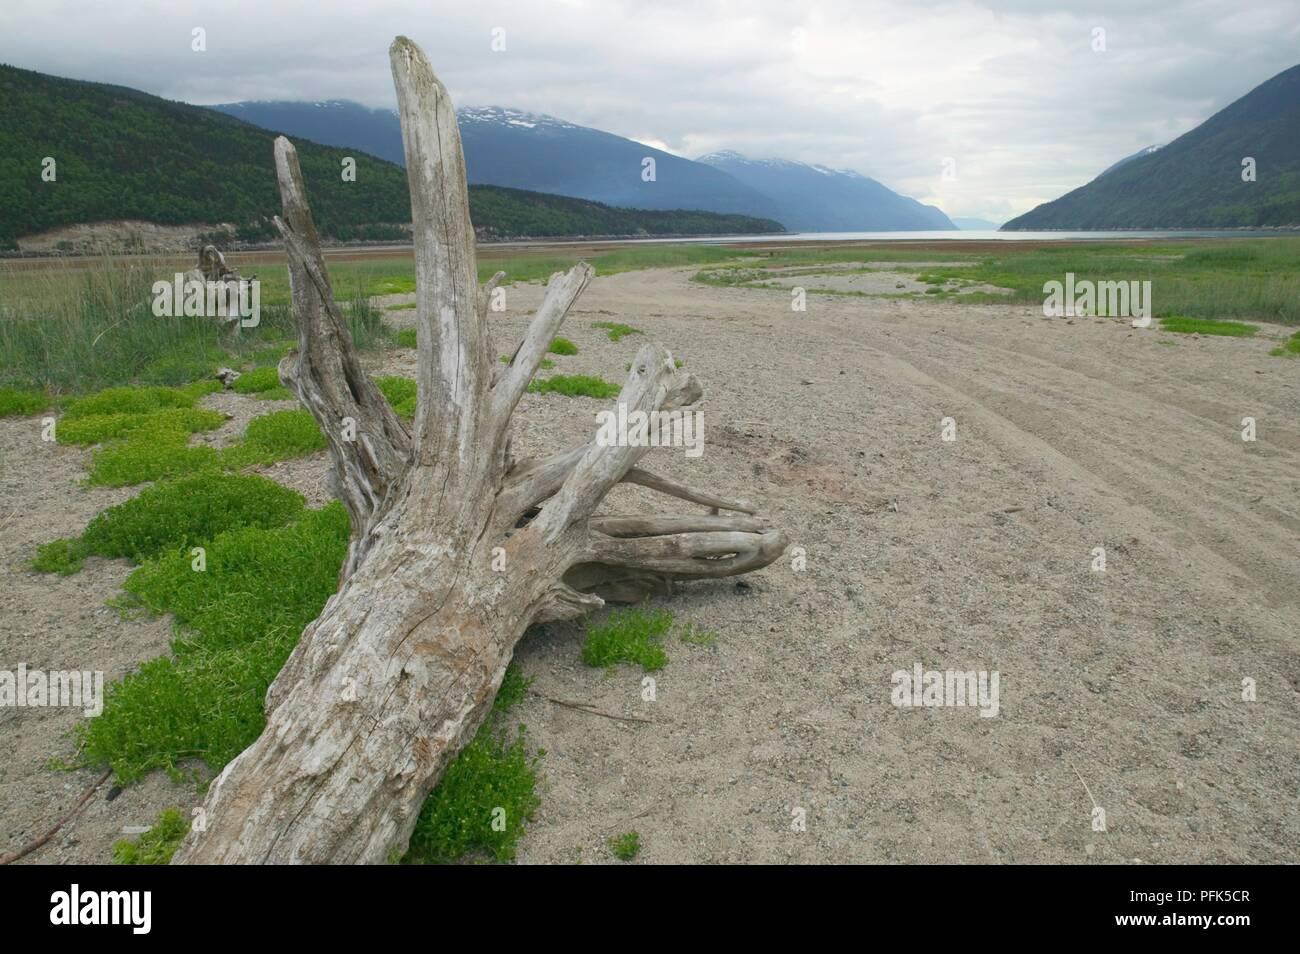 USA, Alaska, Dyea, Taiya Inlet, driftwood on beach - Stock Image